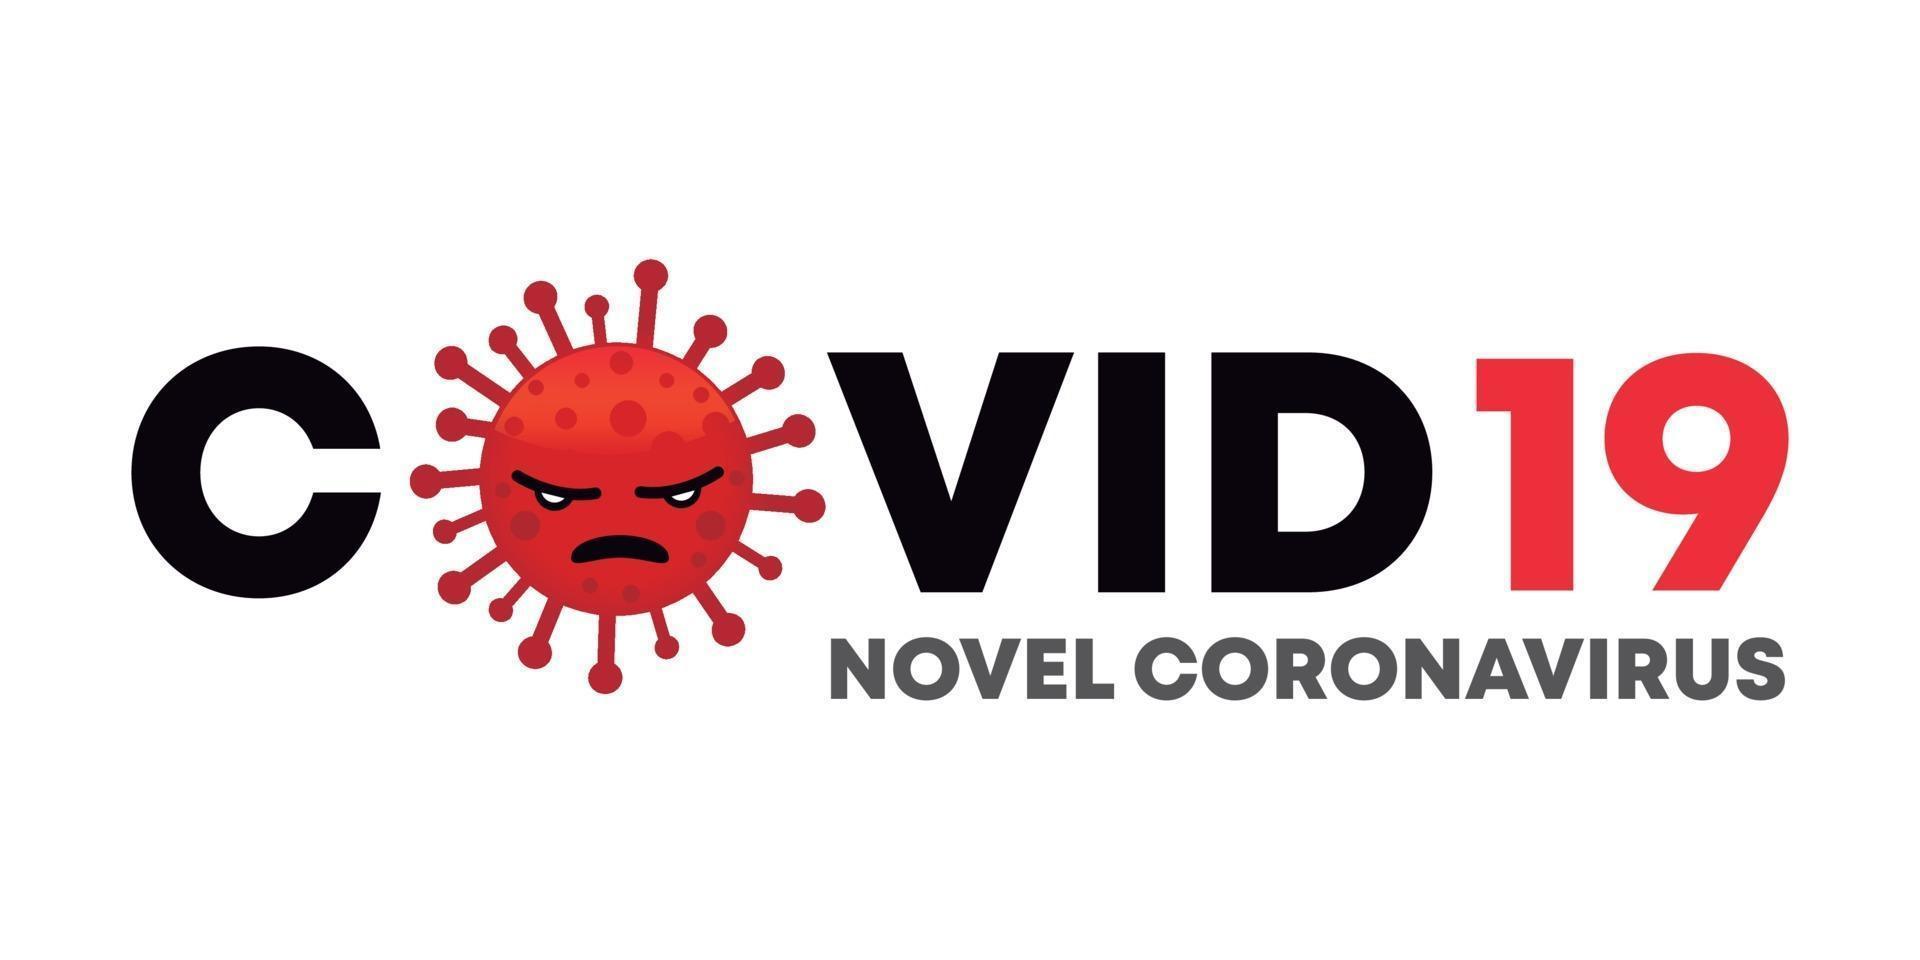 covid 19 roman coronavirus tecknad virusdesign vektor